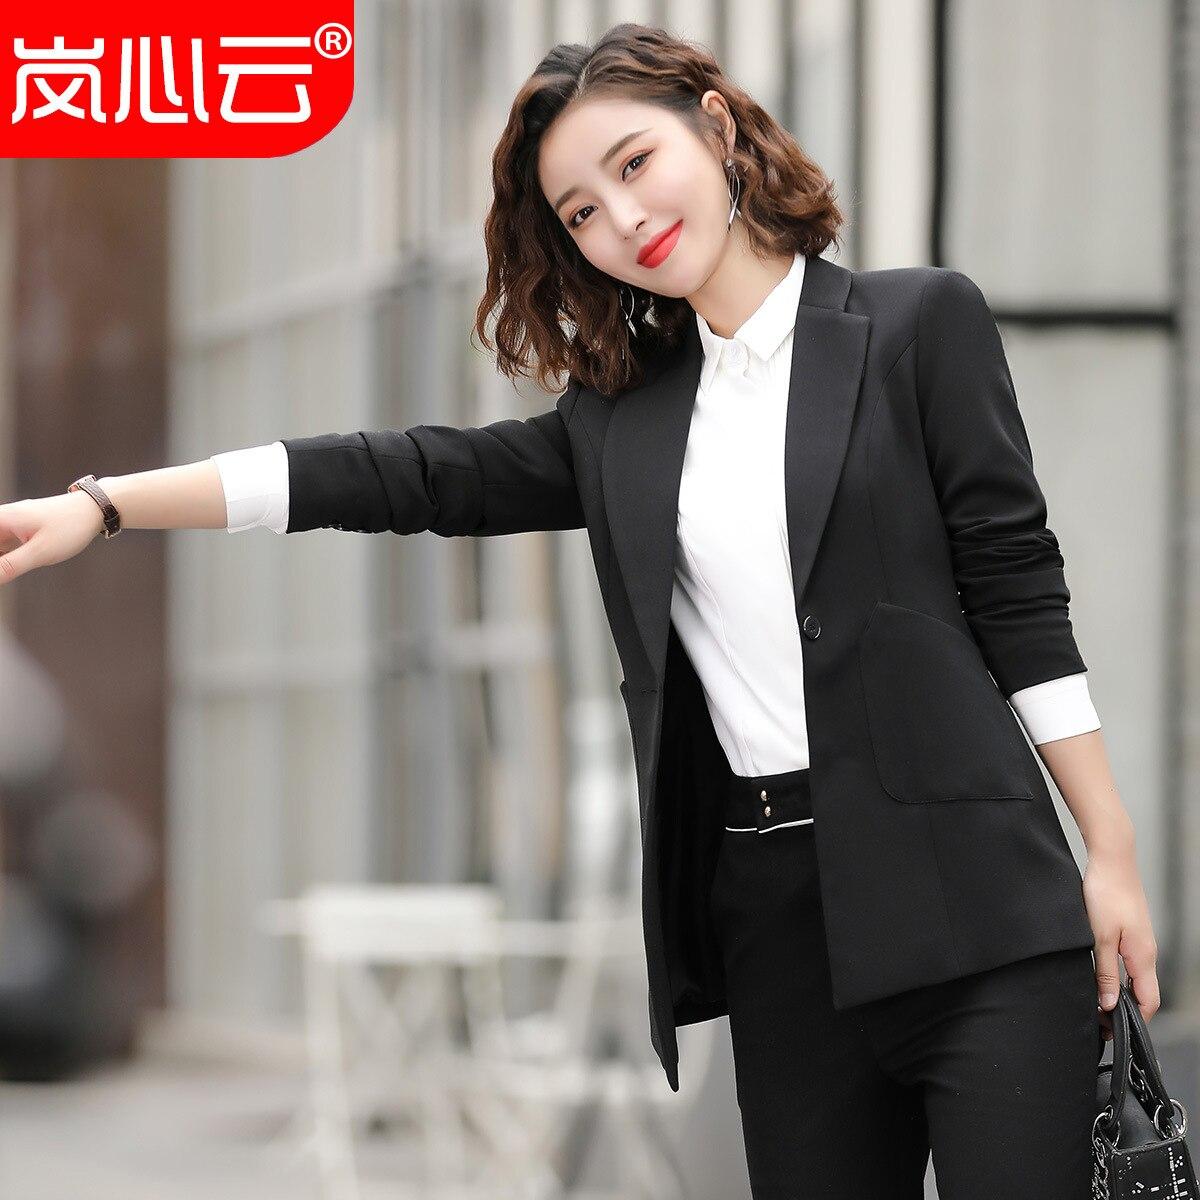 Business WOMEN'S Dress Women's Lawyer Set Formal Wear Work Clothes Long Sleeve Two-Piece Set Black Suit Hotels Clothing